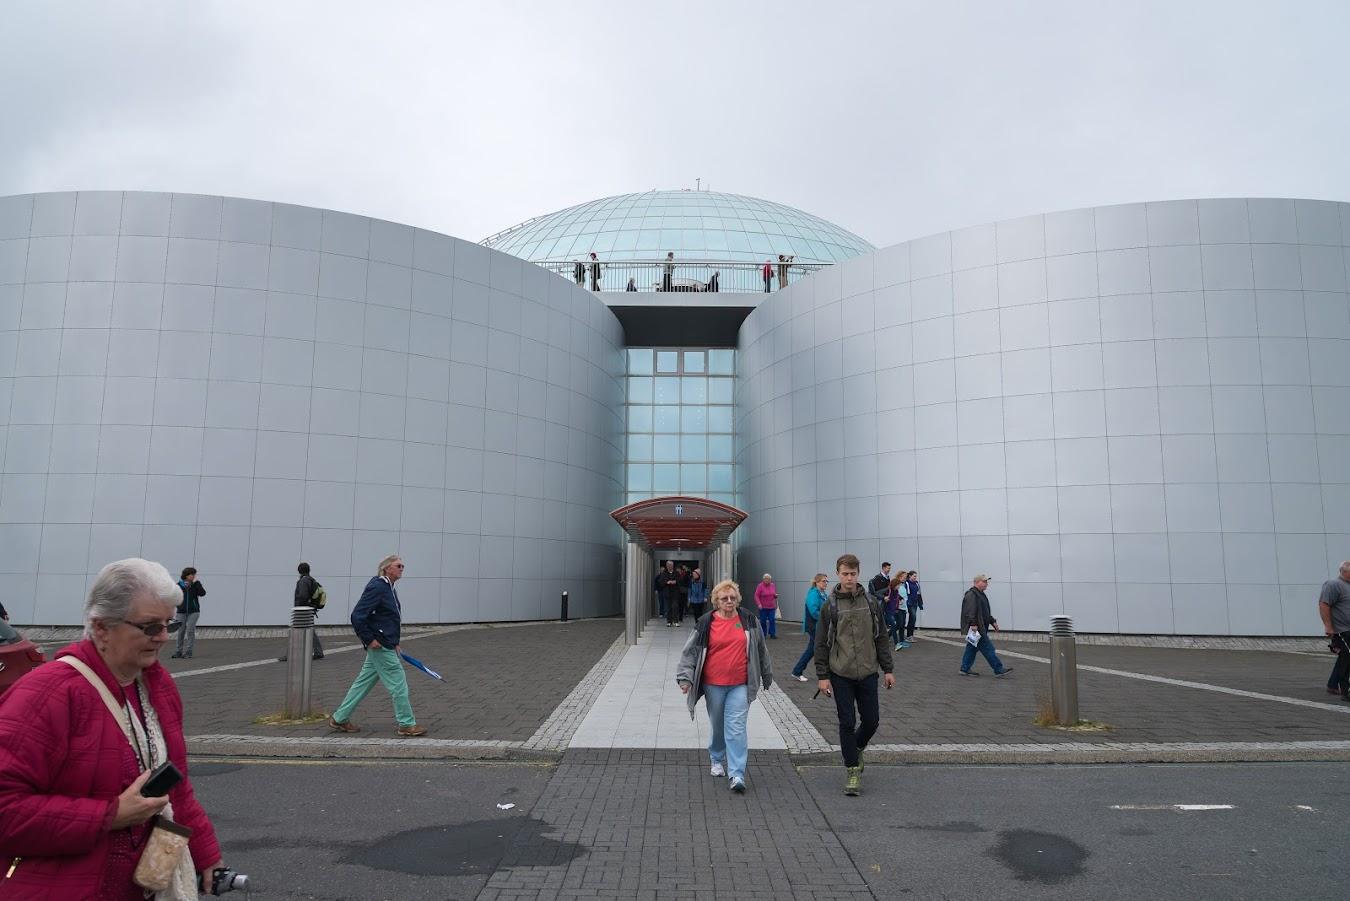 Travel Blog: Day 16 - Reykjavík-> Dinner at Krua Thai Restaurant